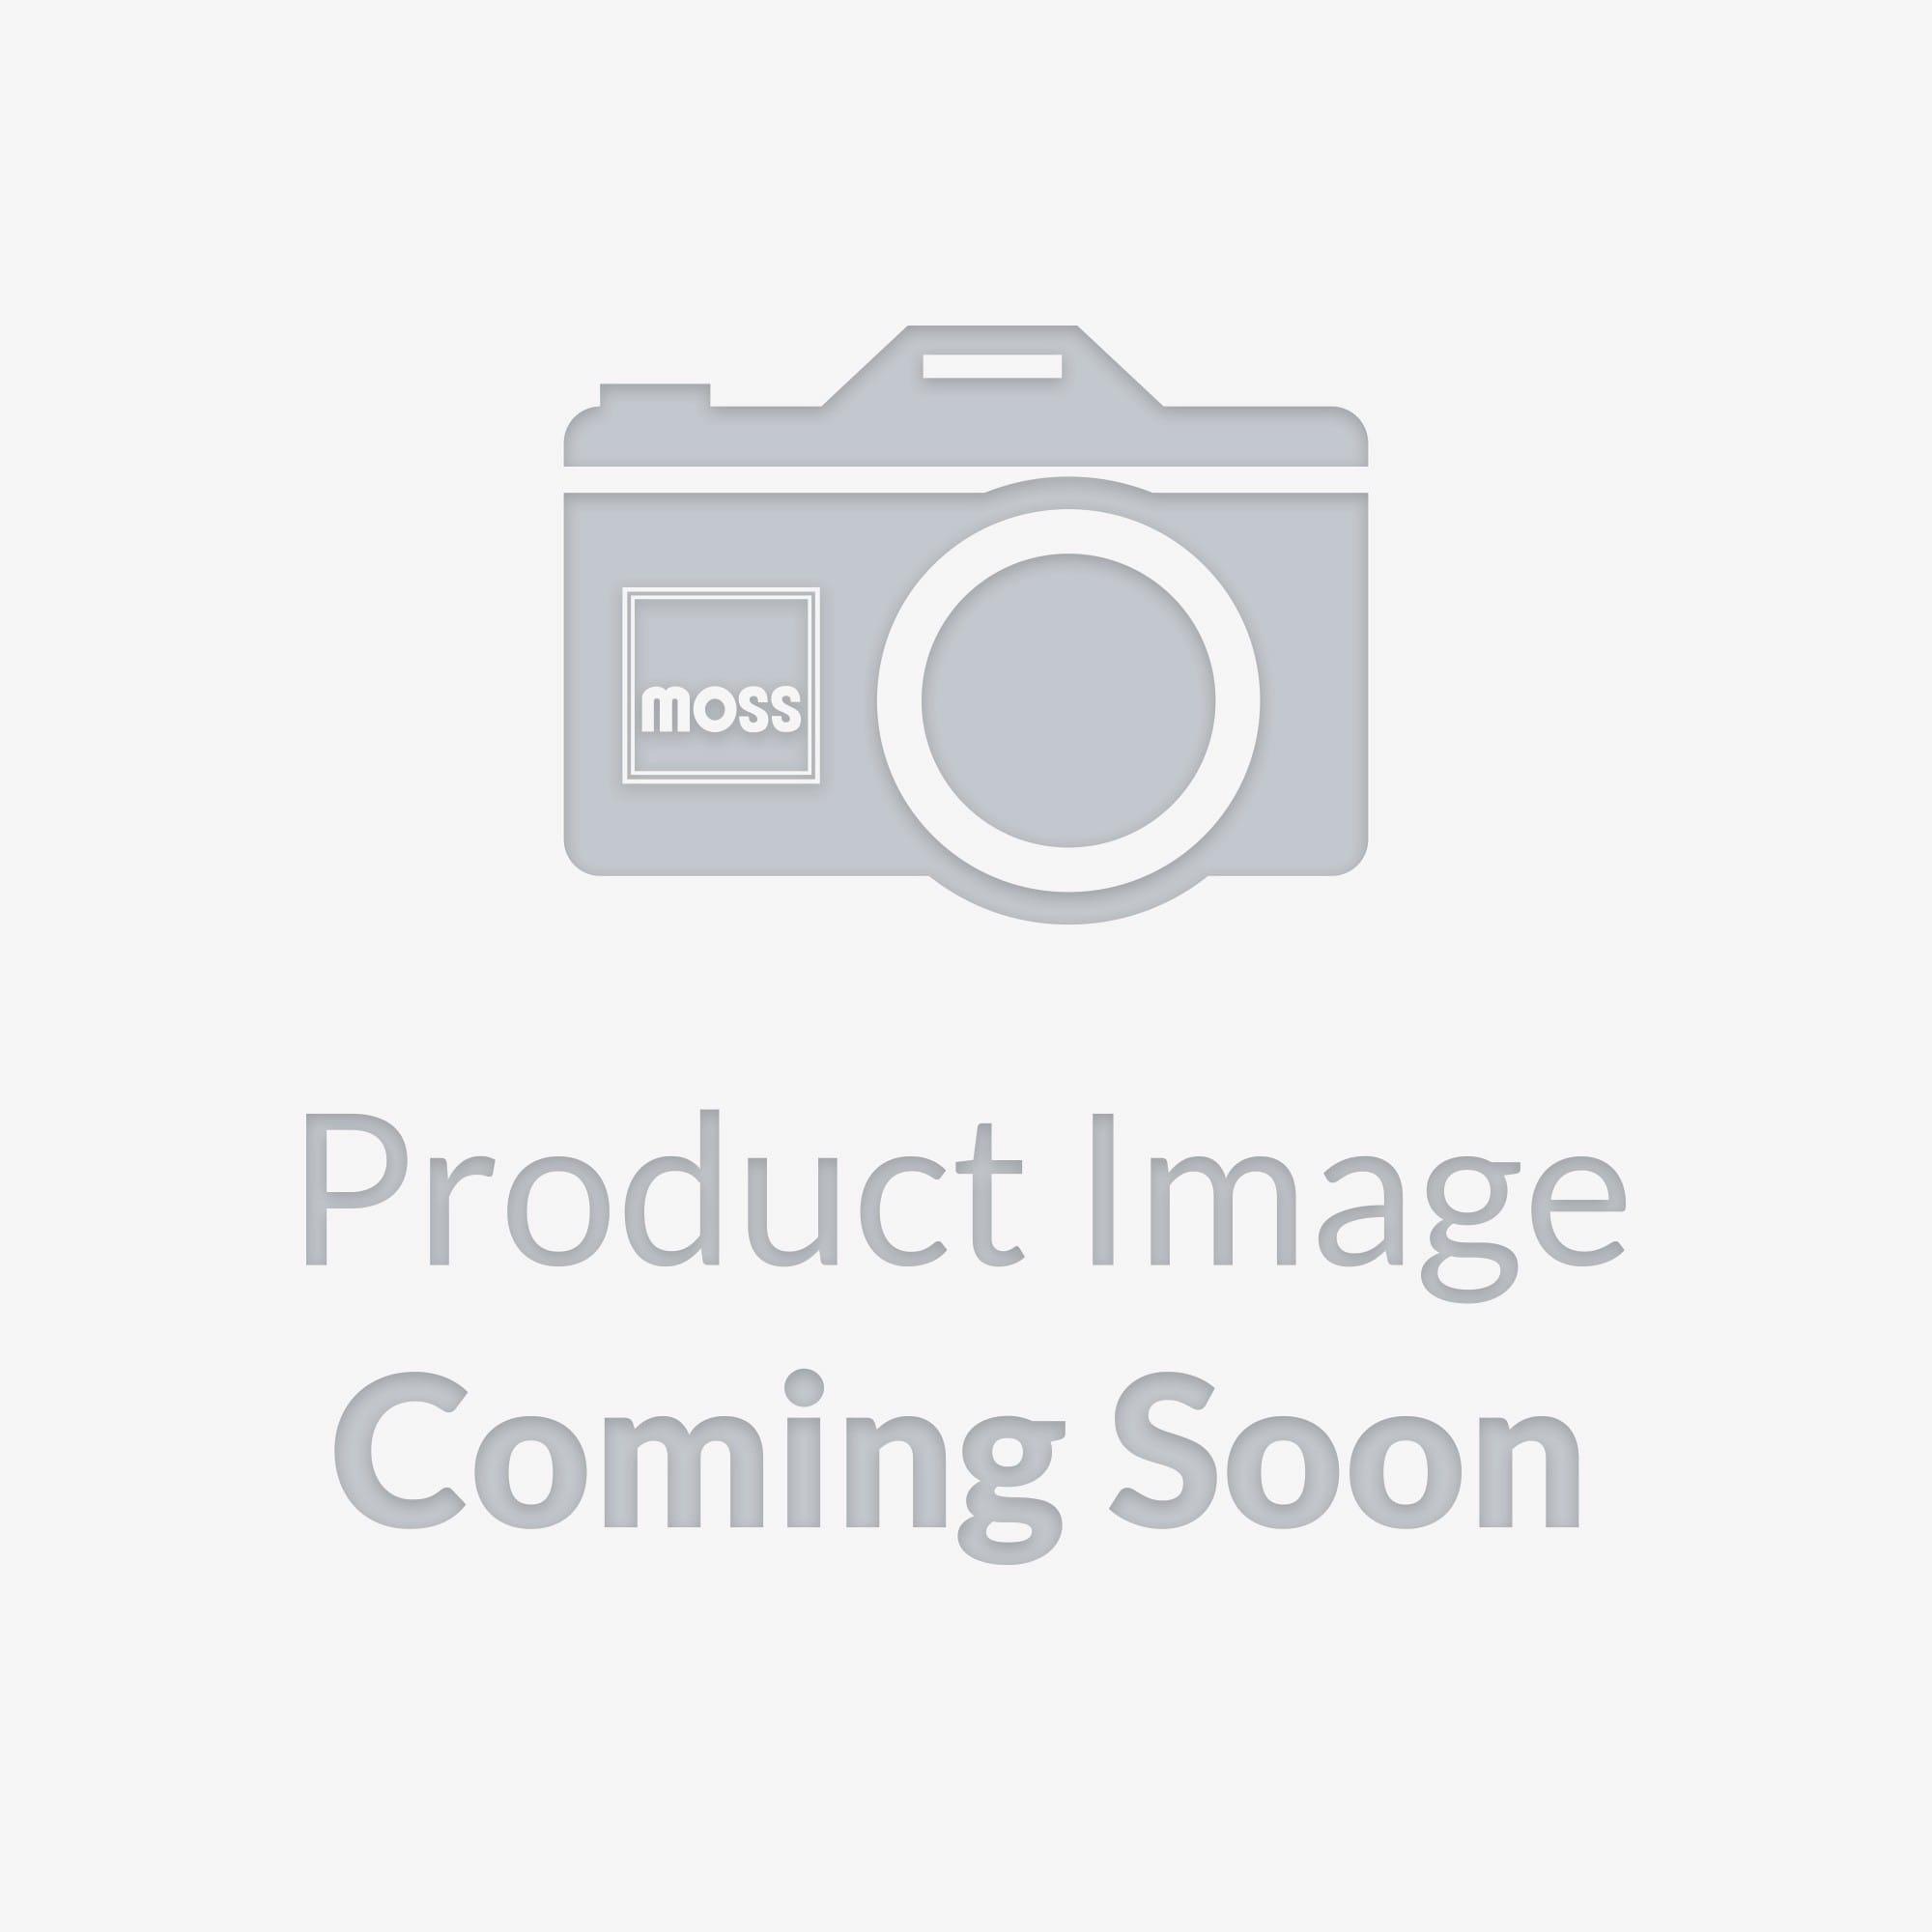 150-080 Supercharger System | Moss Motors